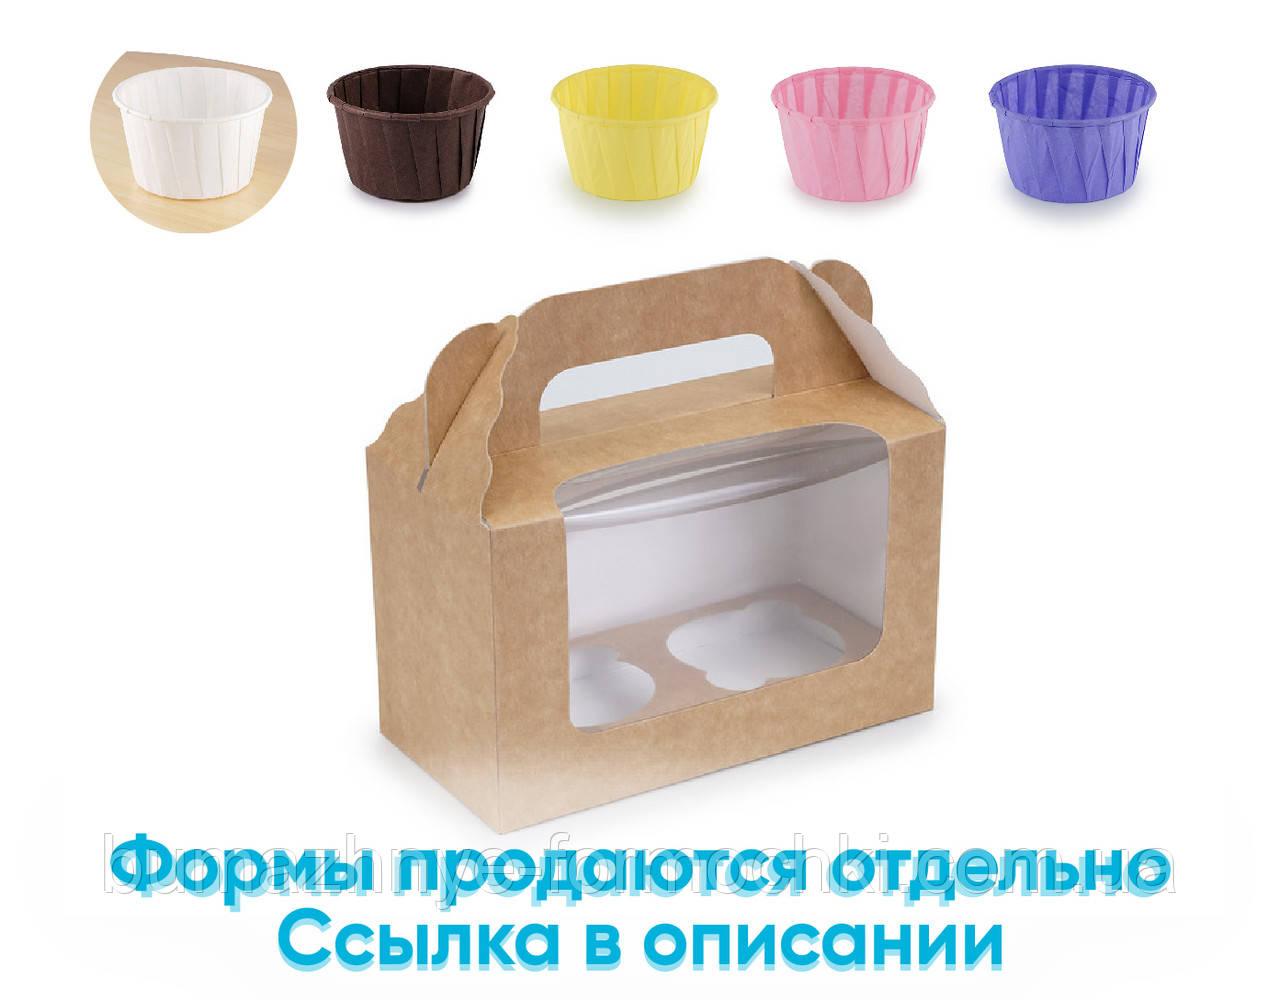 Коробка для капкейков, кексов на 2 шт., крафт, 165*80*105 (10 шт)